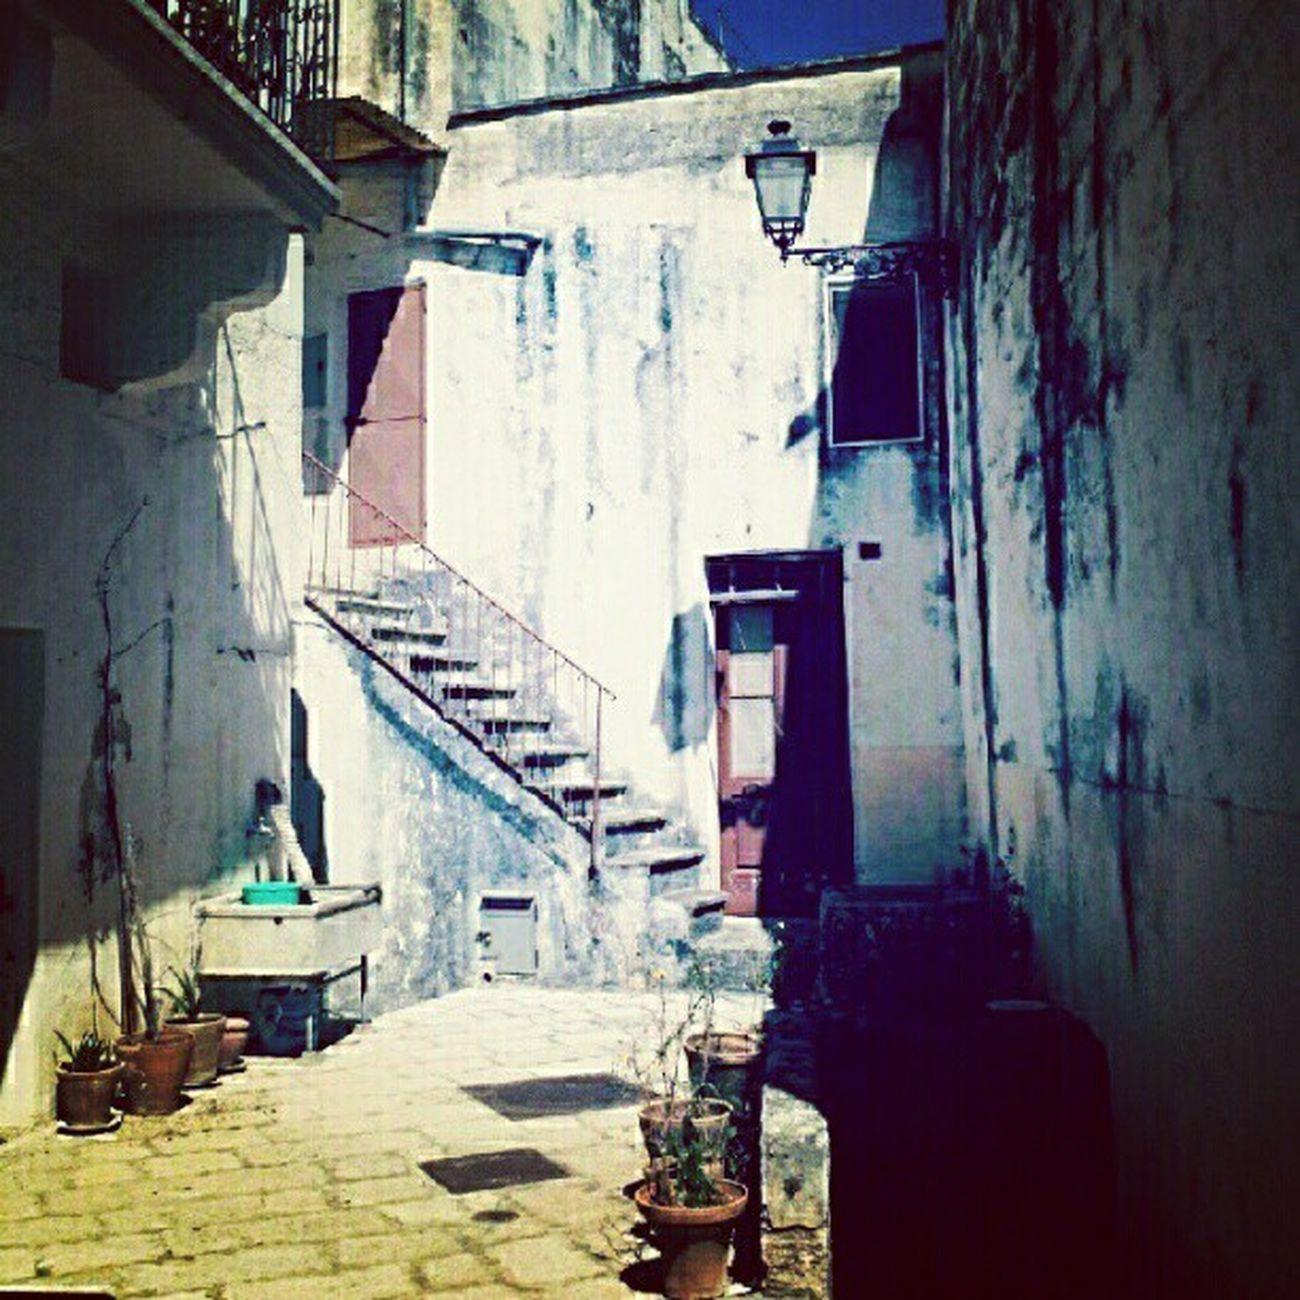 Salento Specchia Borgo Apúlia Puglia webstagram igerspuglia igersitalia streetphotography